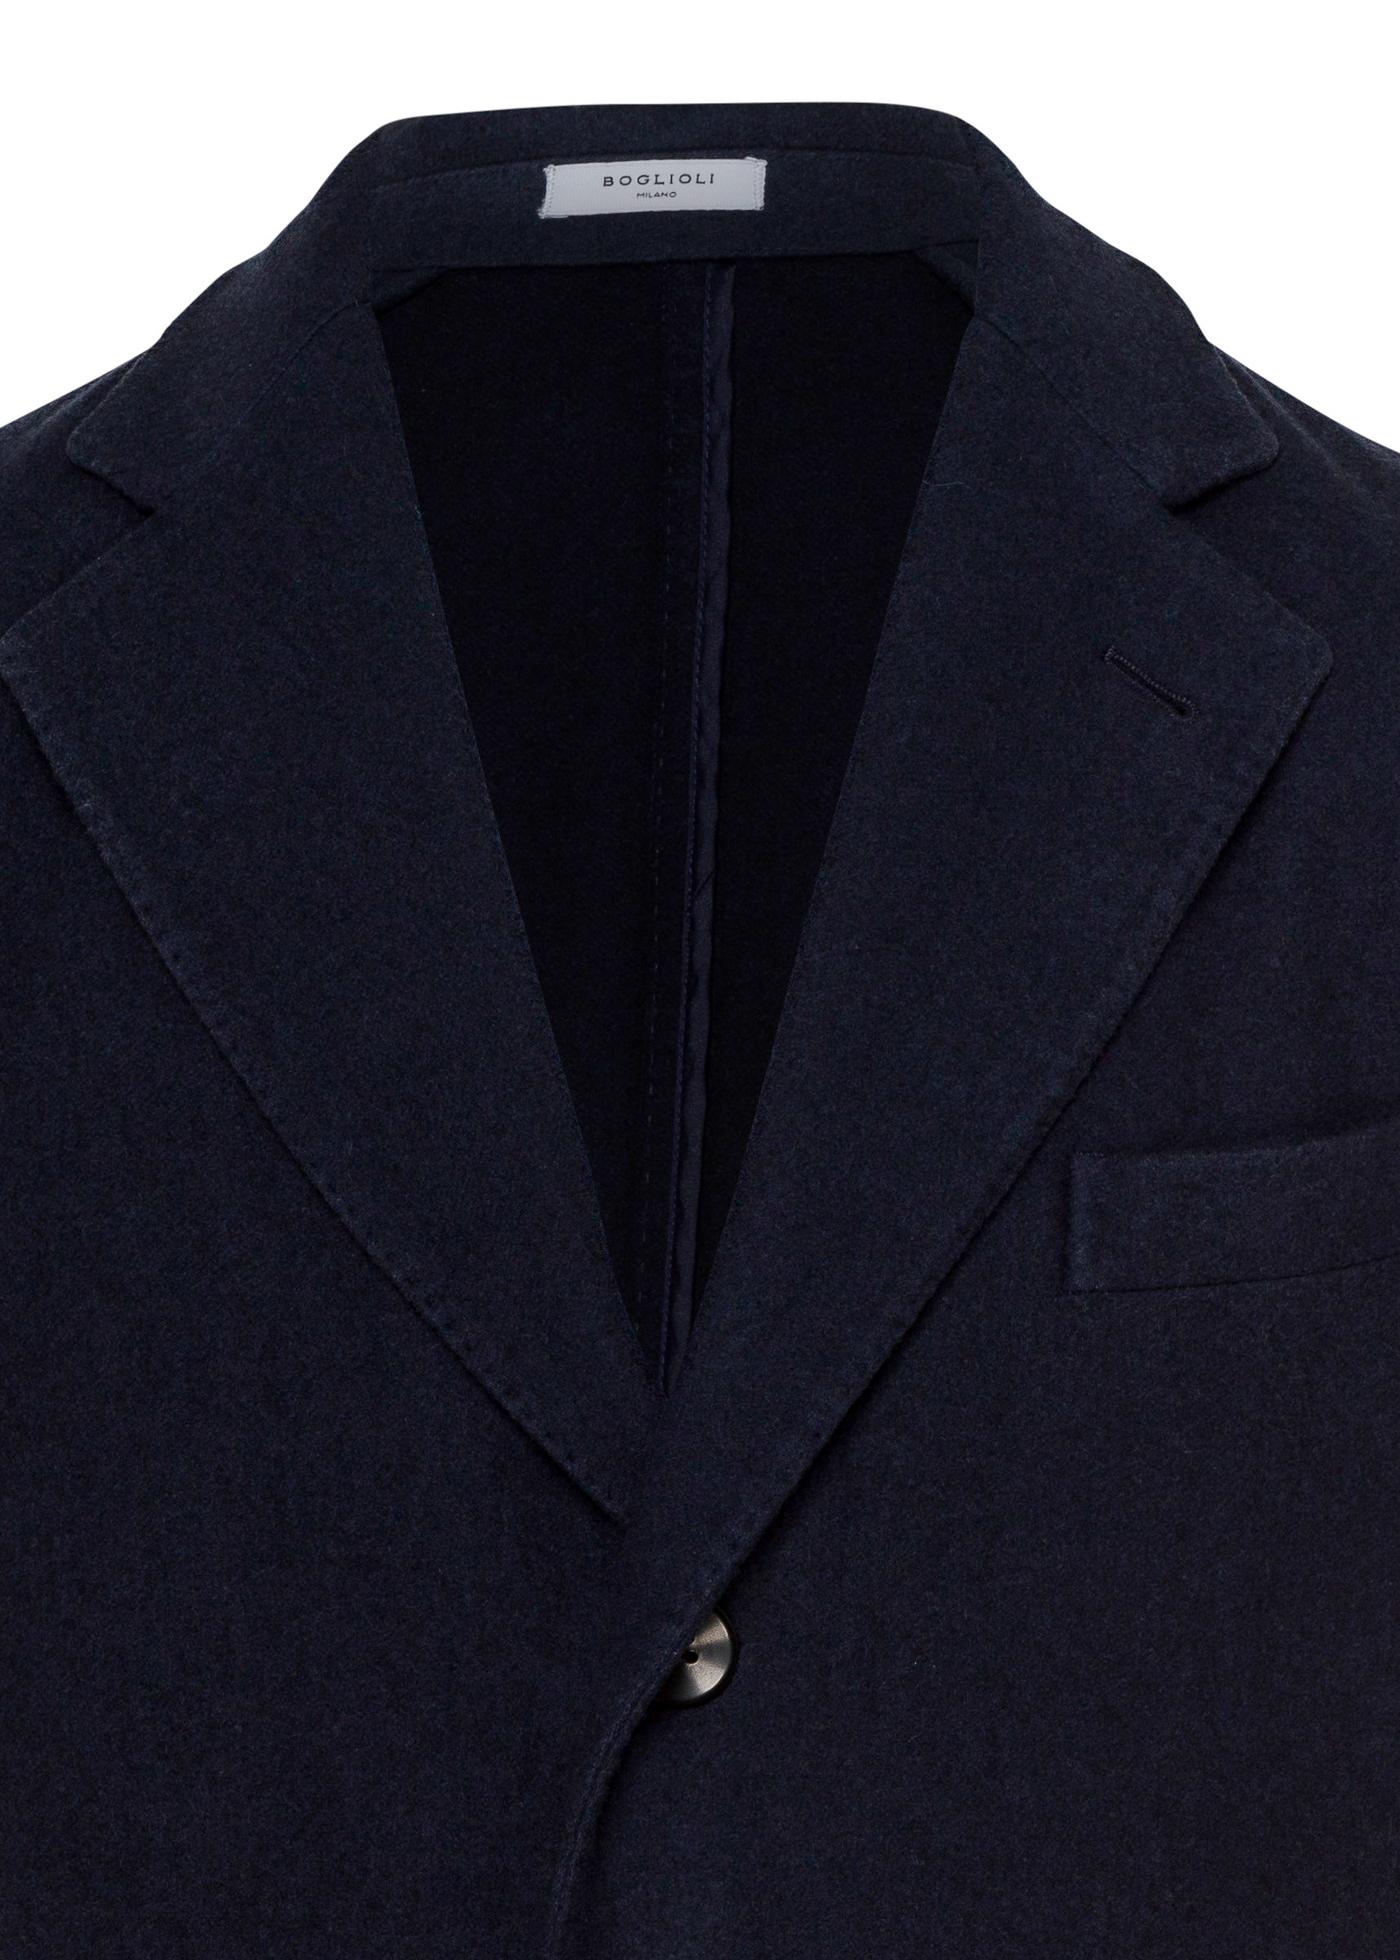 Washed Wool Coat SB image number 2